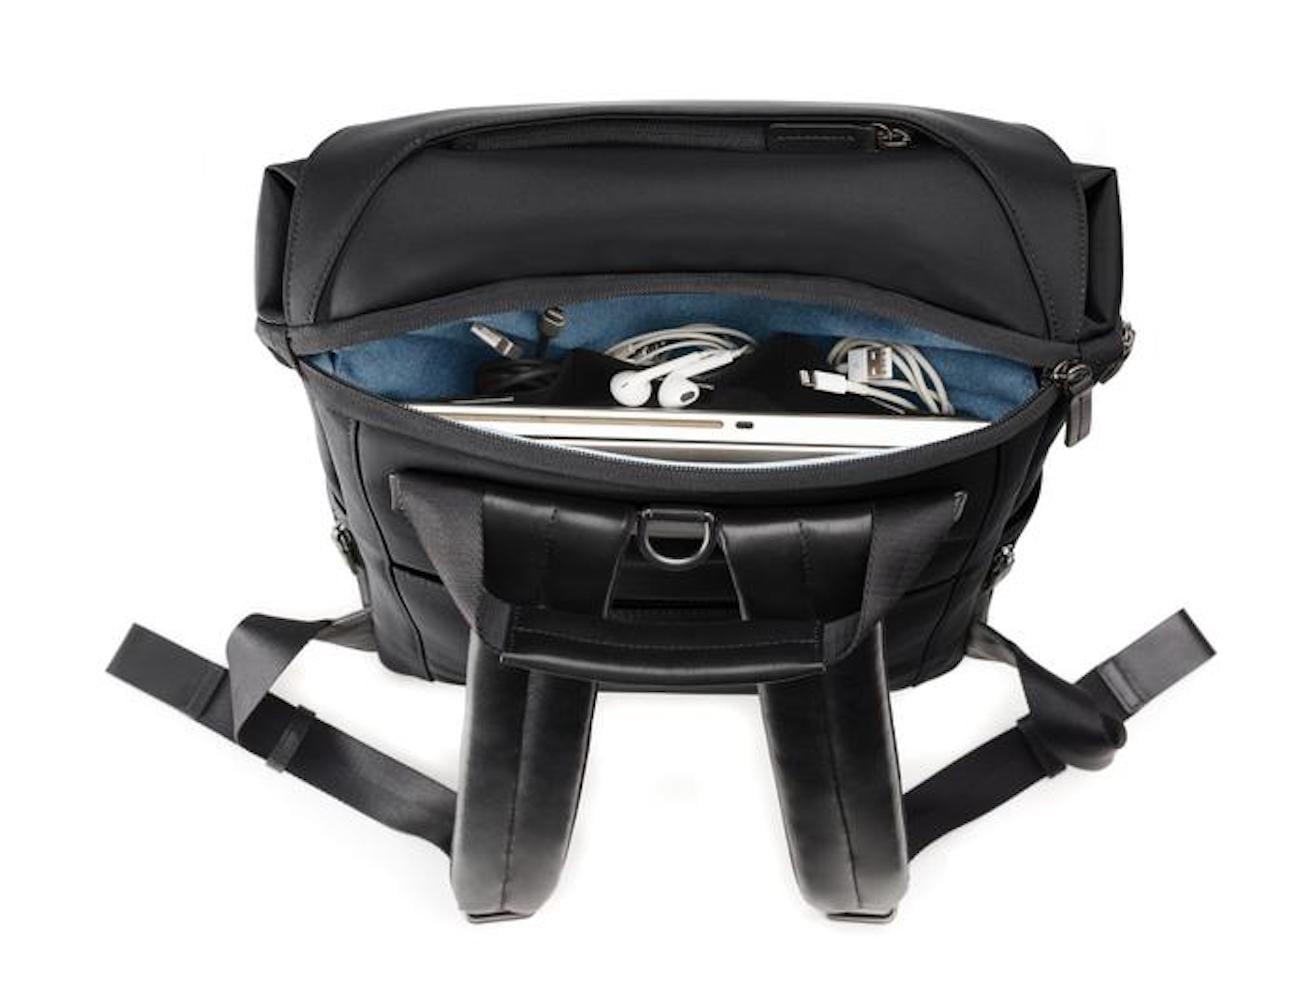 cbf13d31e0f5 Stuart   Lau Capstone Lightweight Waterproof Backpack » Gadget Flow